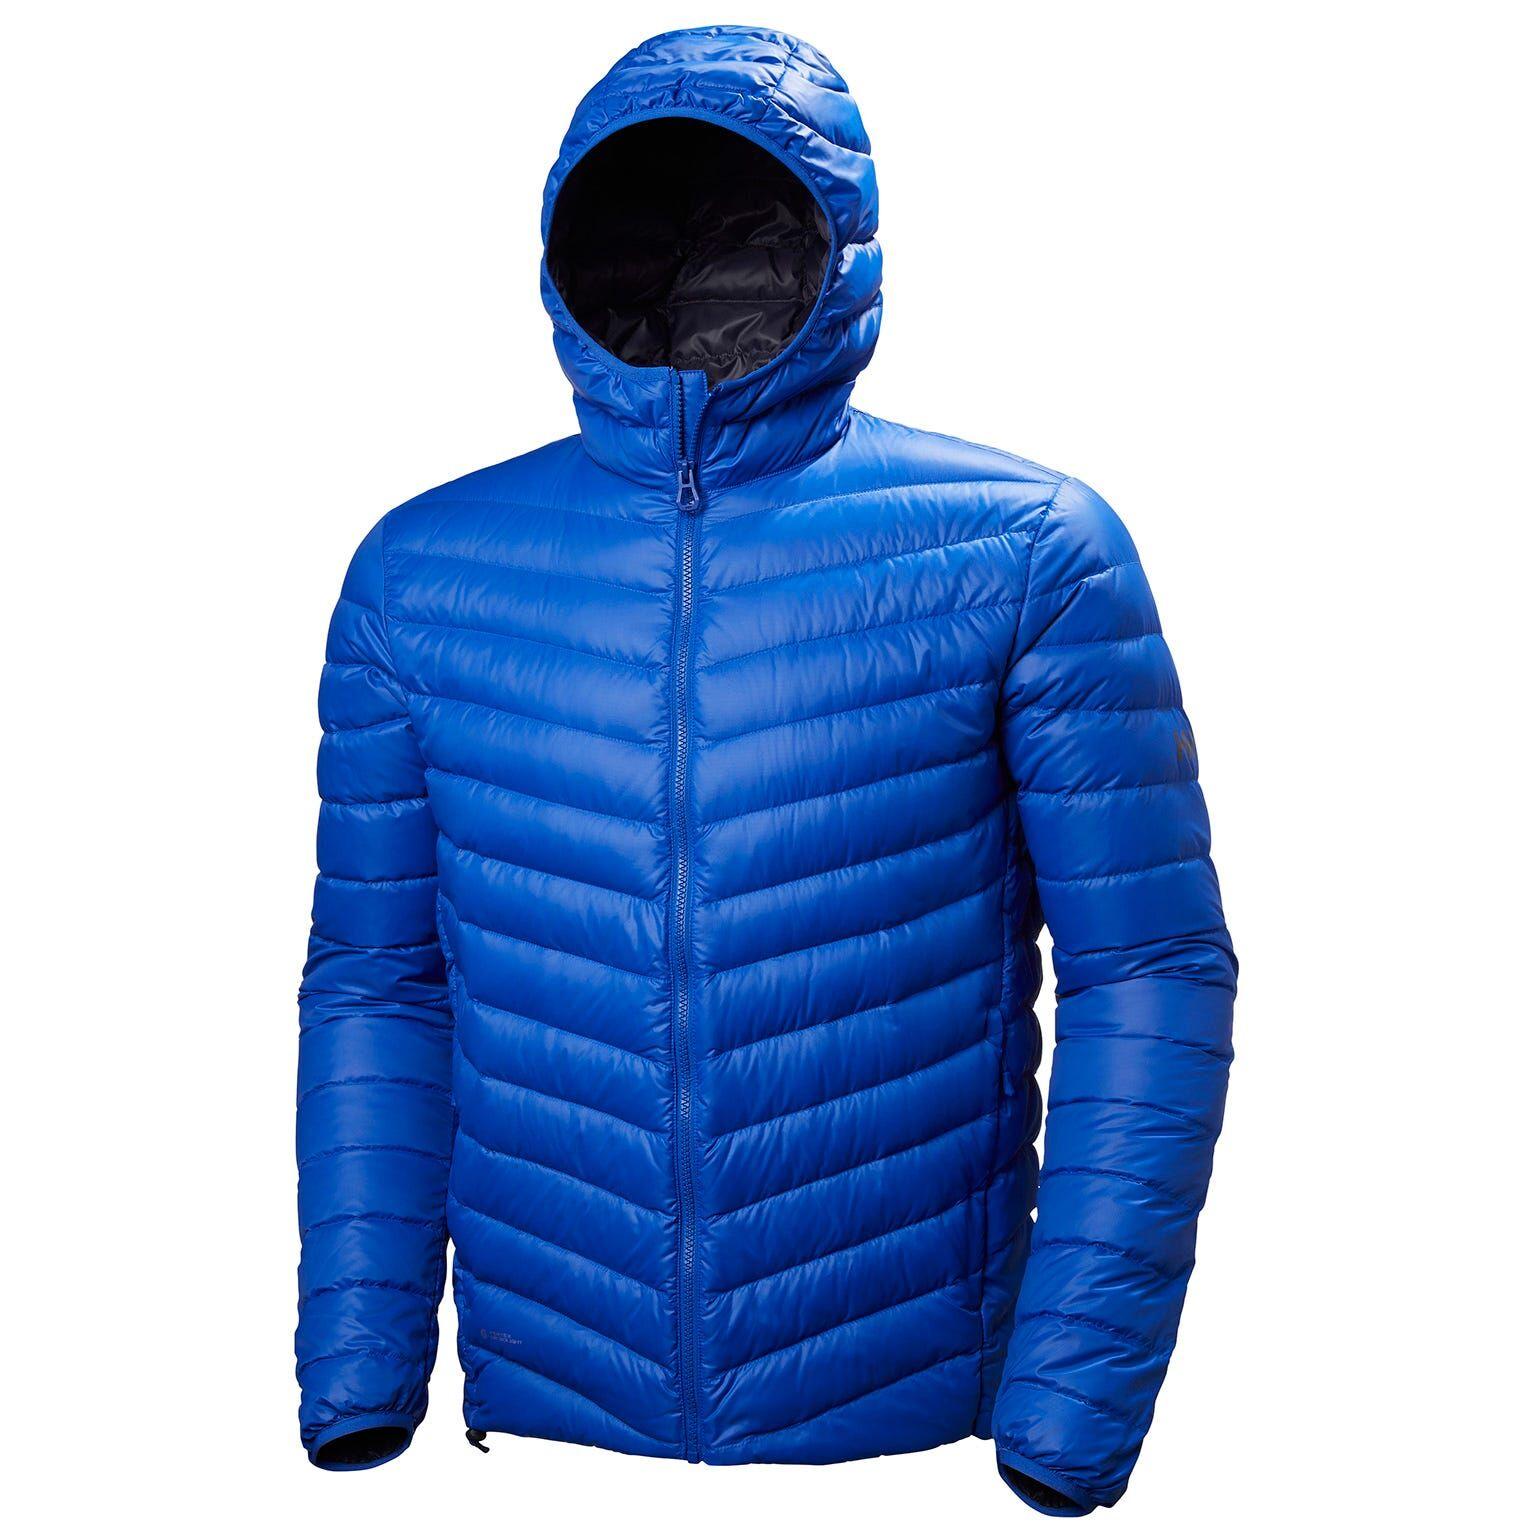 Helly Hansen Verglas Hooded Down Insulator Mens Hiking Jacket Blue XL